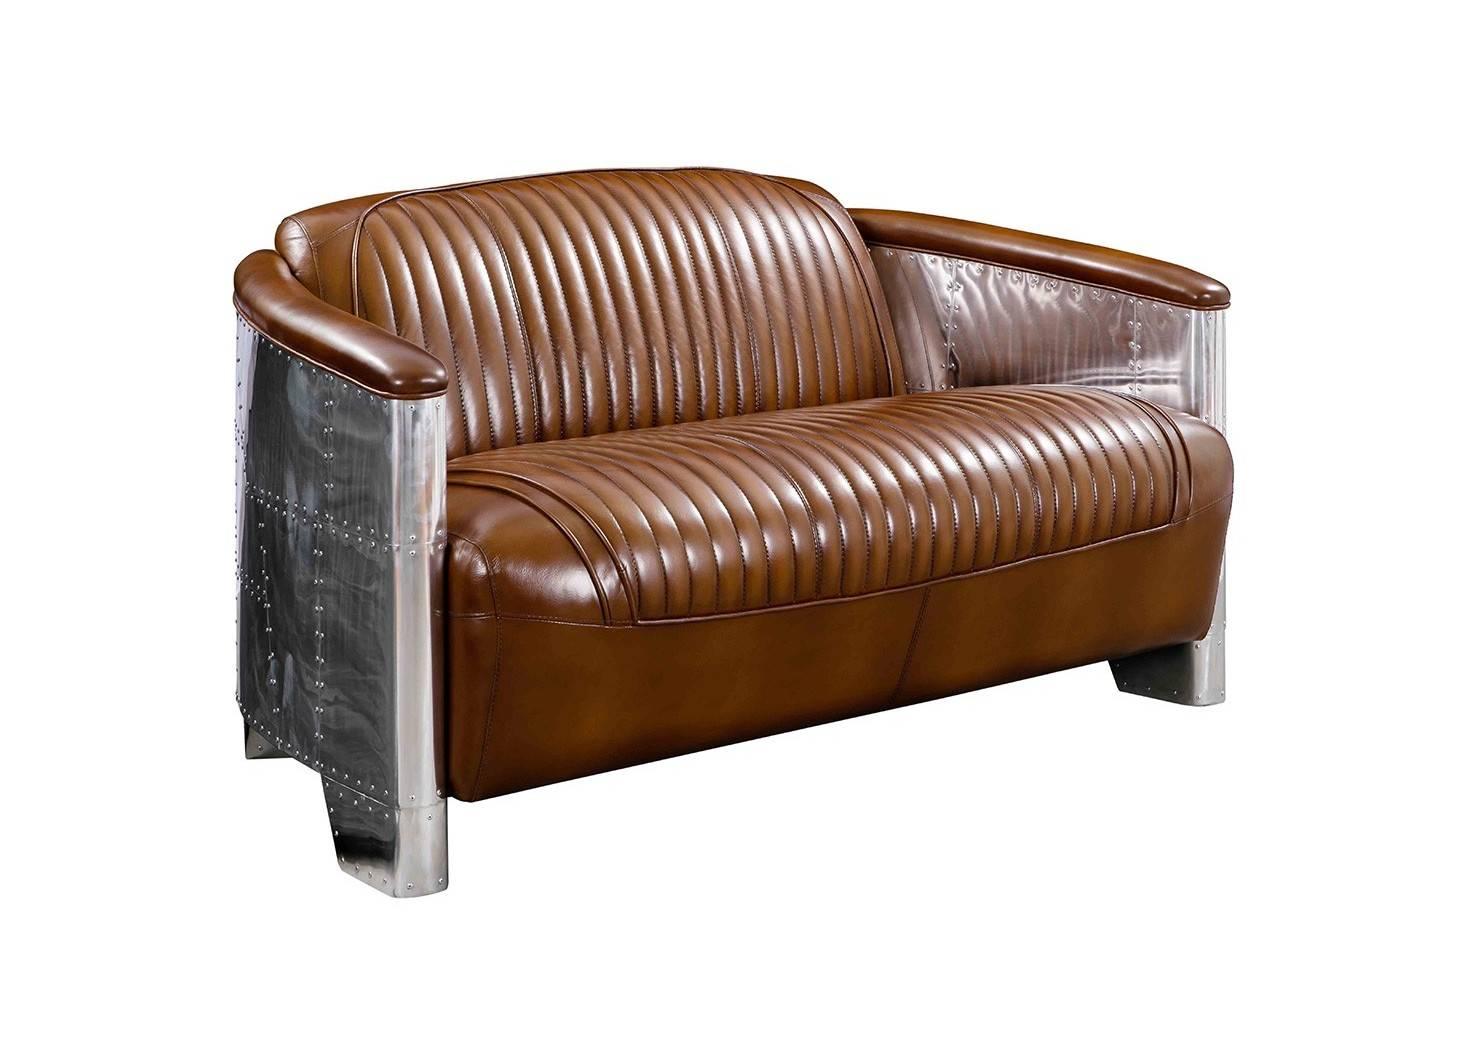 Aviator settee in brown leather